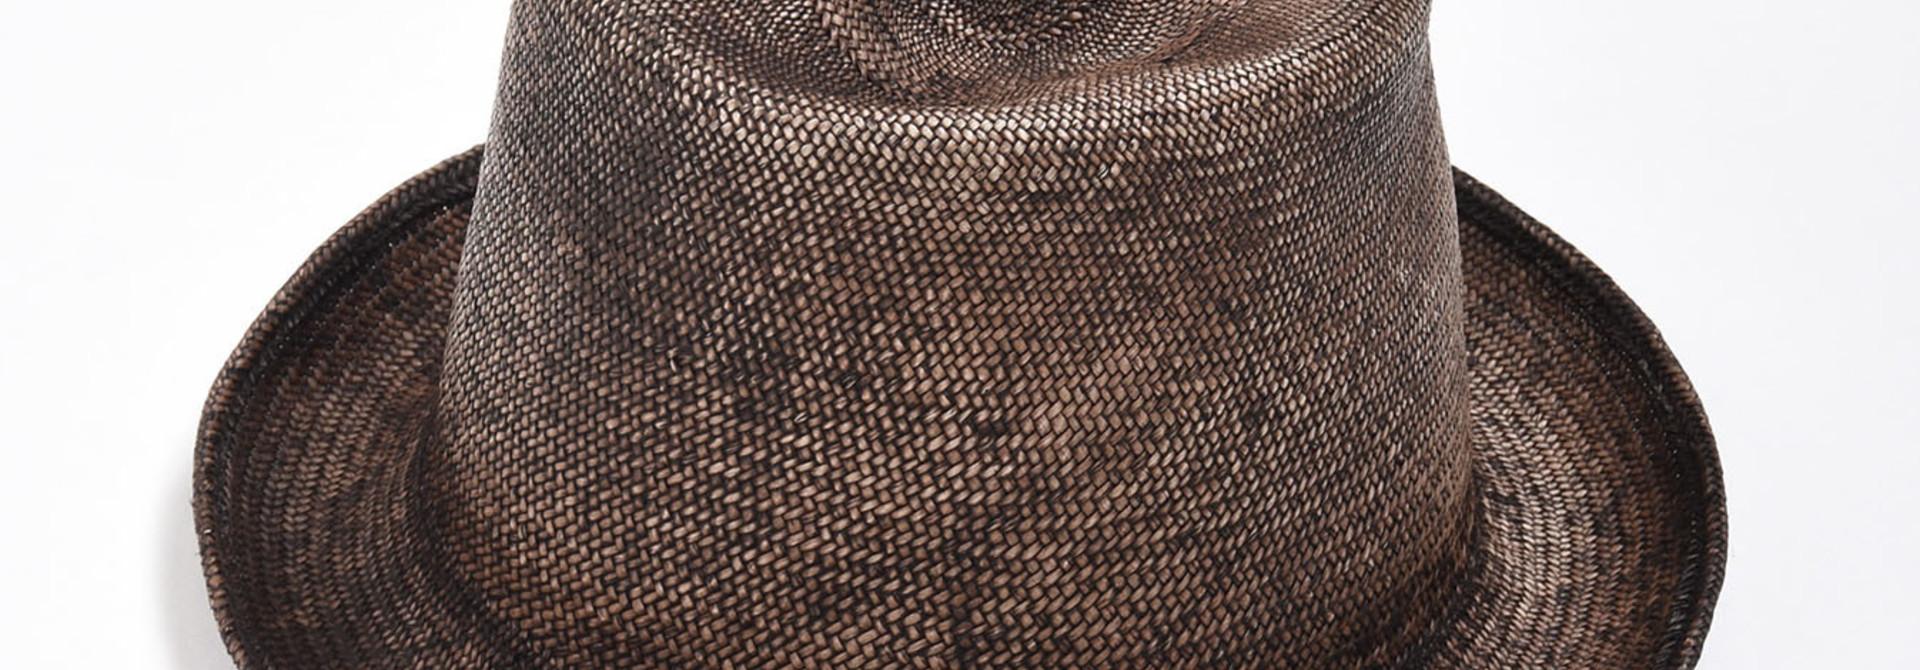 Piece-dyed Panama Hat